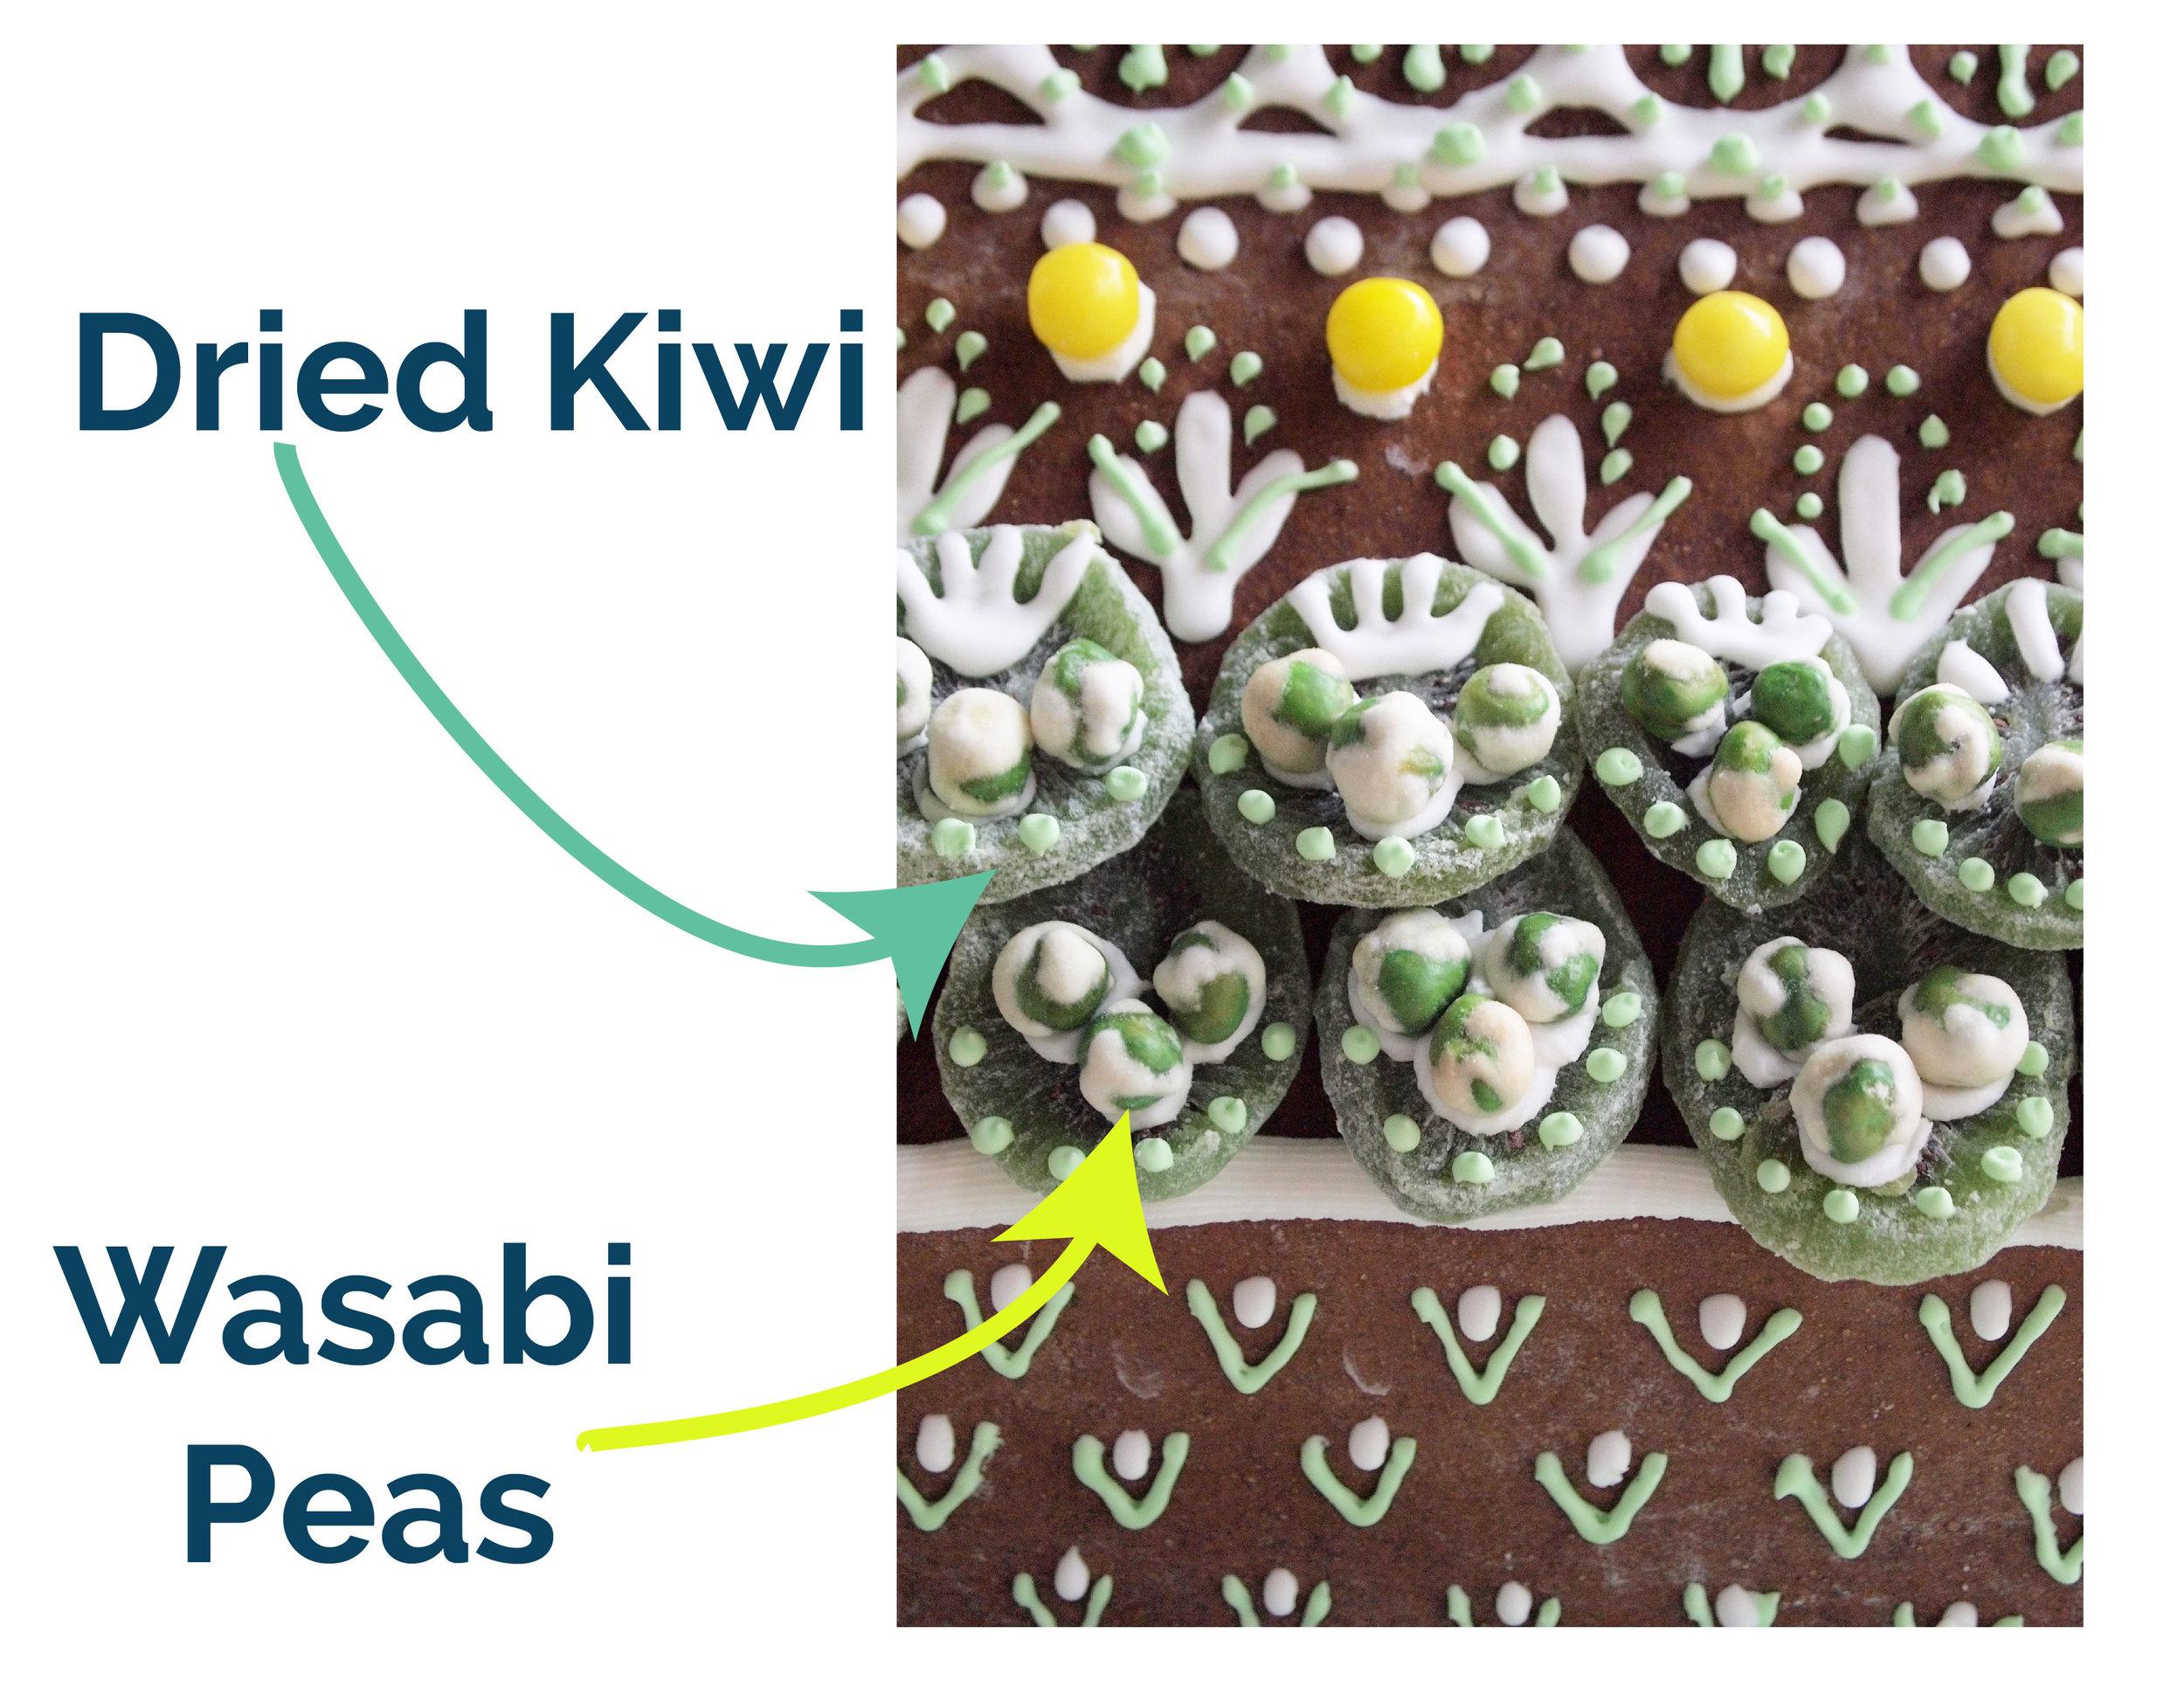 kiwi and wasabi graphic test-01.jpg